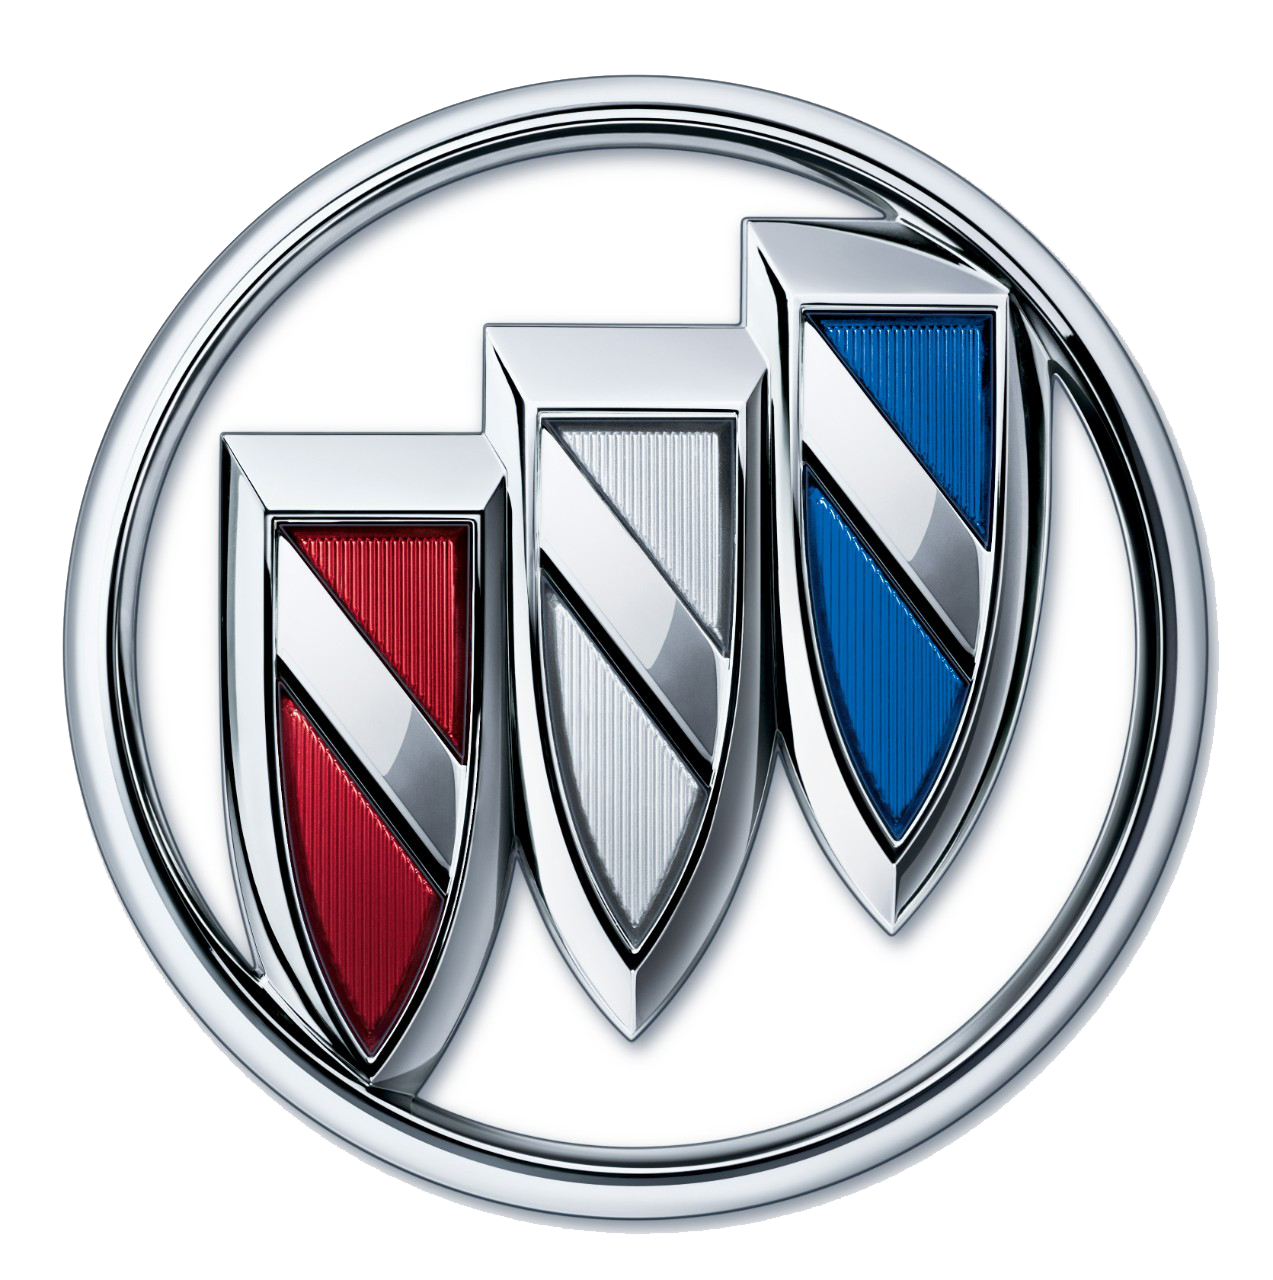 https://secureservercdn.net/198.71.233.197/39k.840.myftpupload.com/wp-content/uploads/2020/01/Buick_Logo-2014-10-16-19.png